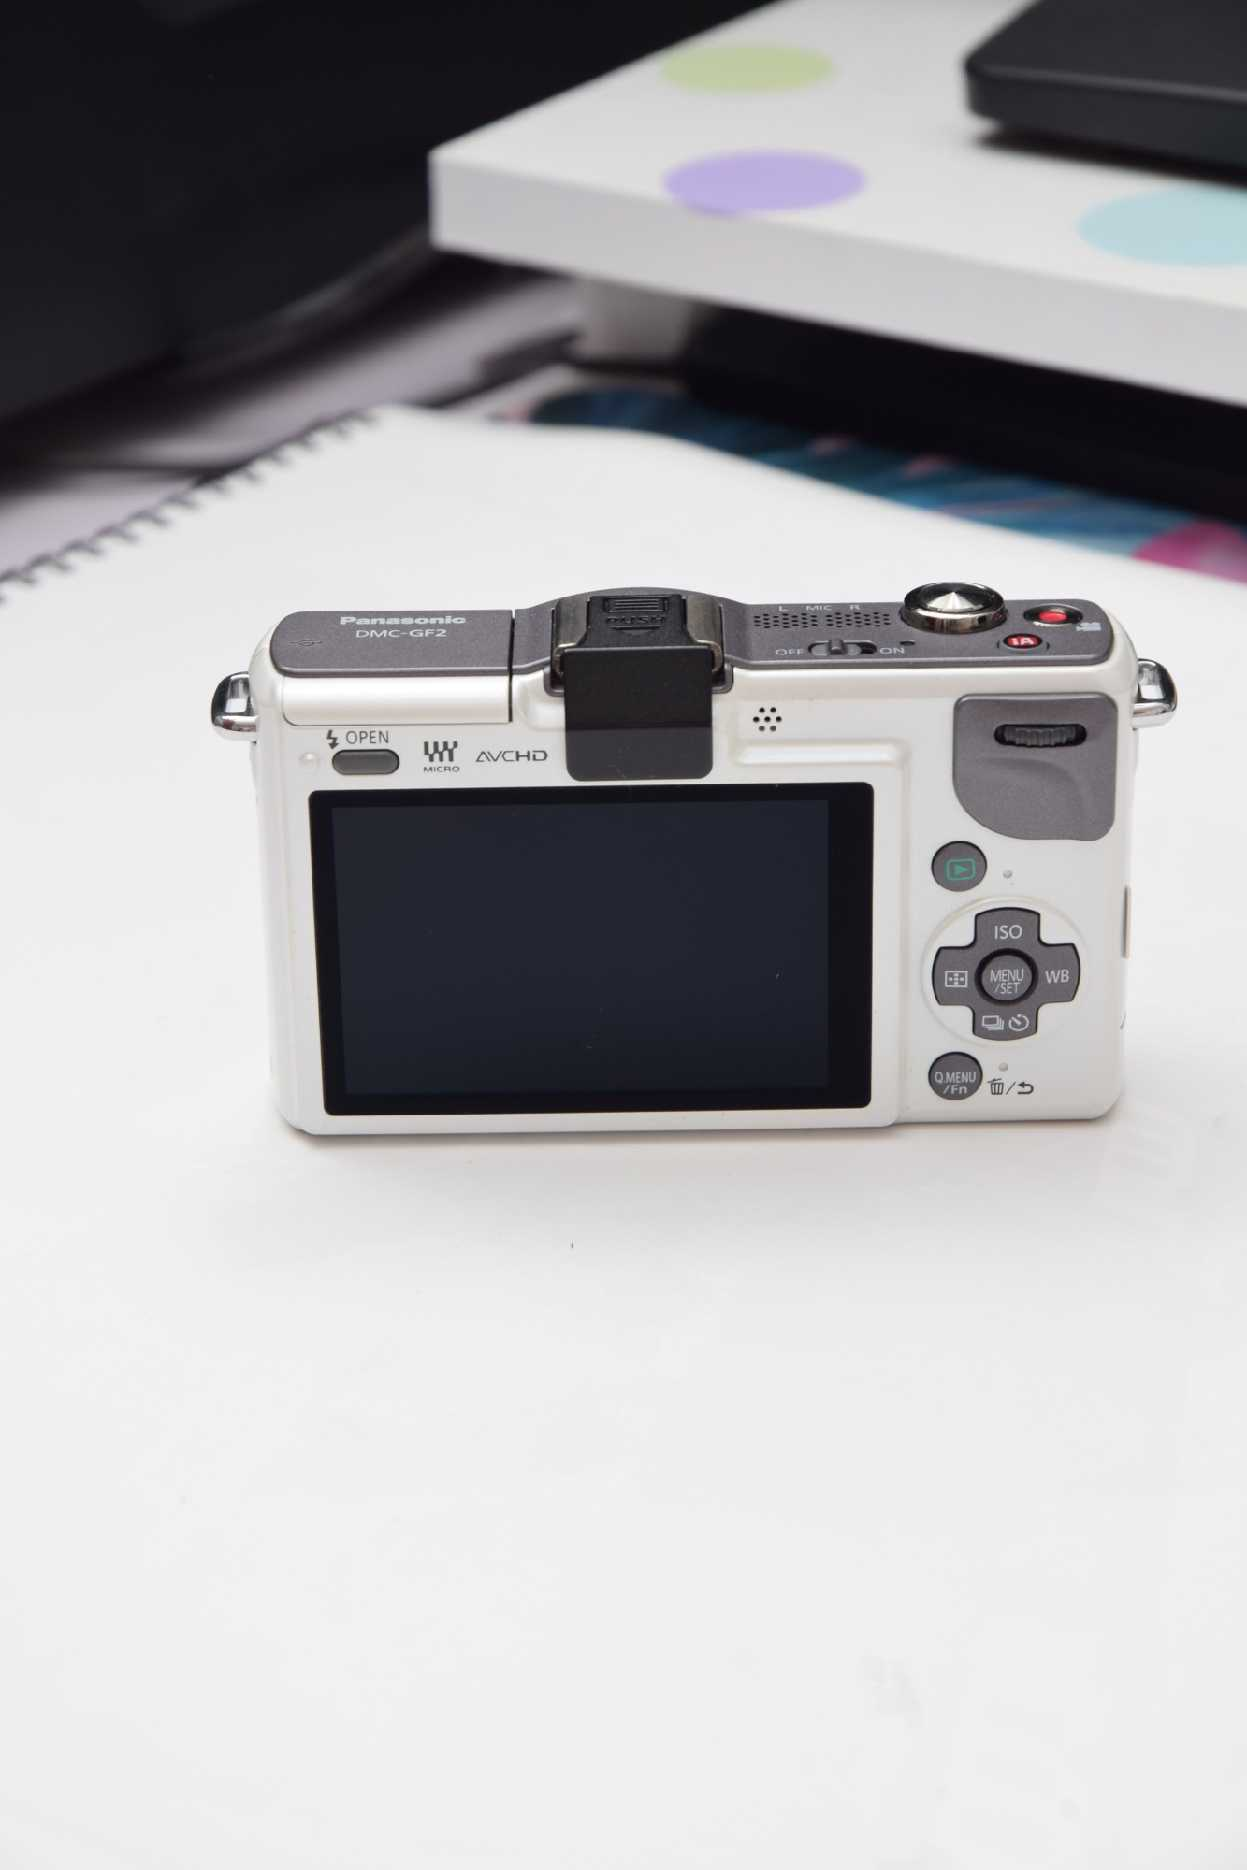 USED Panasonic GF2 12 1MP Digital Camera with 3 inch LCD NO LENS OR WITH LENS USED,Panasonic GF2 12.1MP  Digital Camera with 3-inch LCD(NO LENS OR WITH LENS)